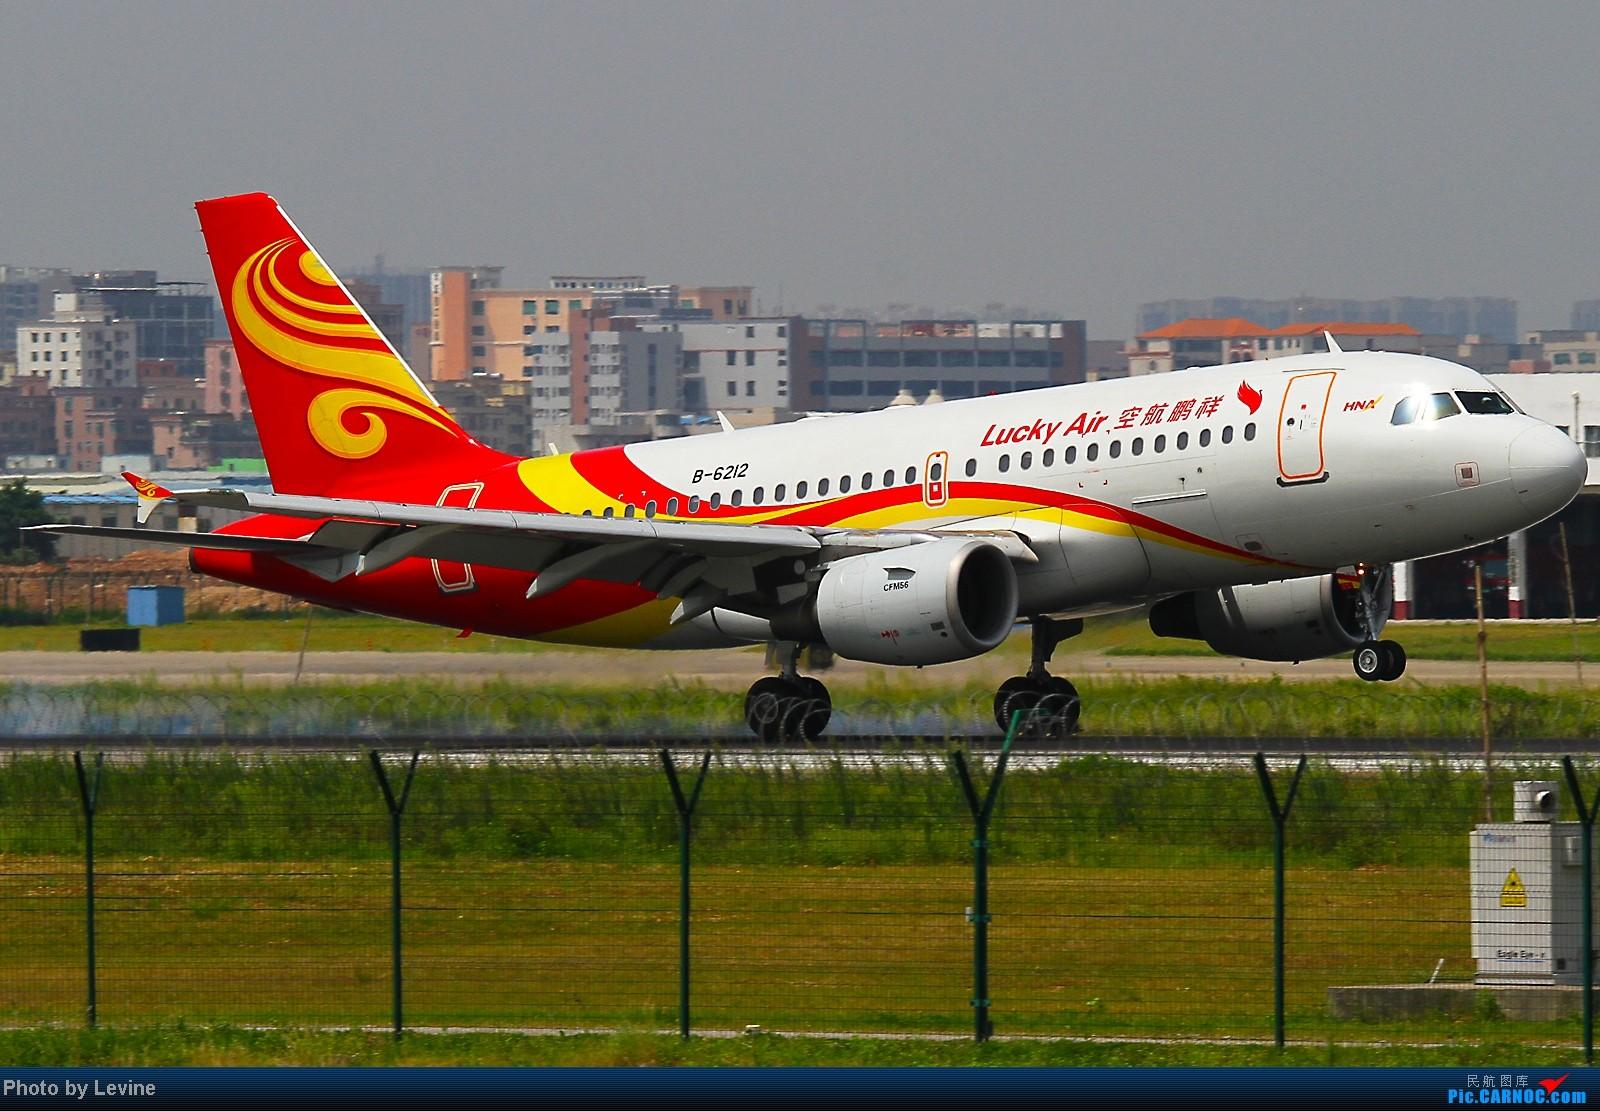 Re:[转贴][深圳飞友会]夏天第一拍 小试牛刀 AIRBUS A319-100 B-6212 中国深圳宝安机场